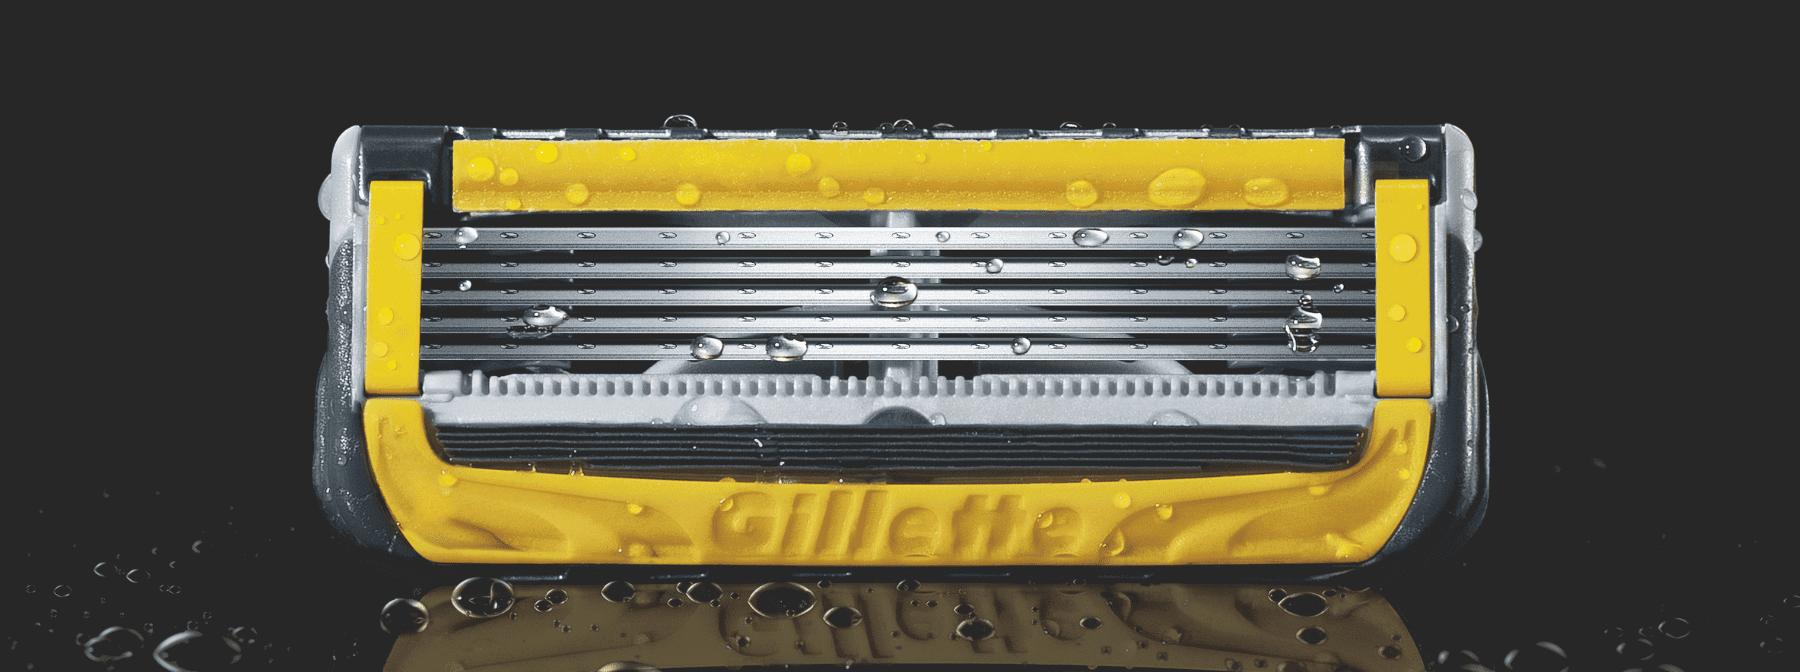 Why More Razor Blades Make a Difference: Gillette Multi-Blade Razors